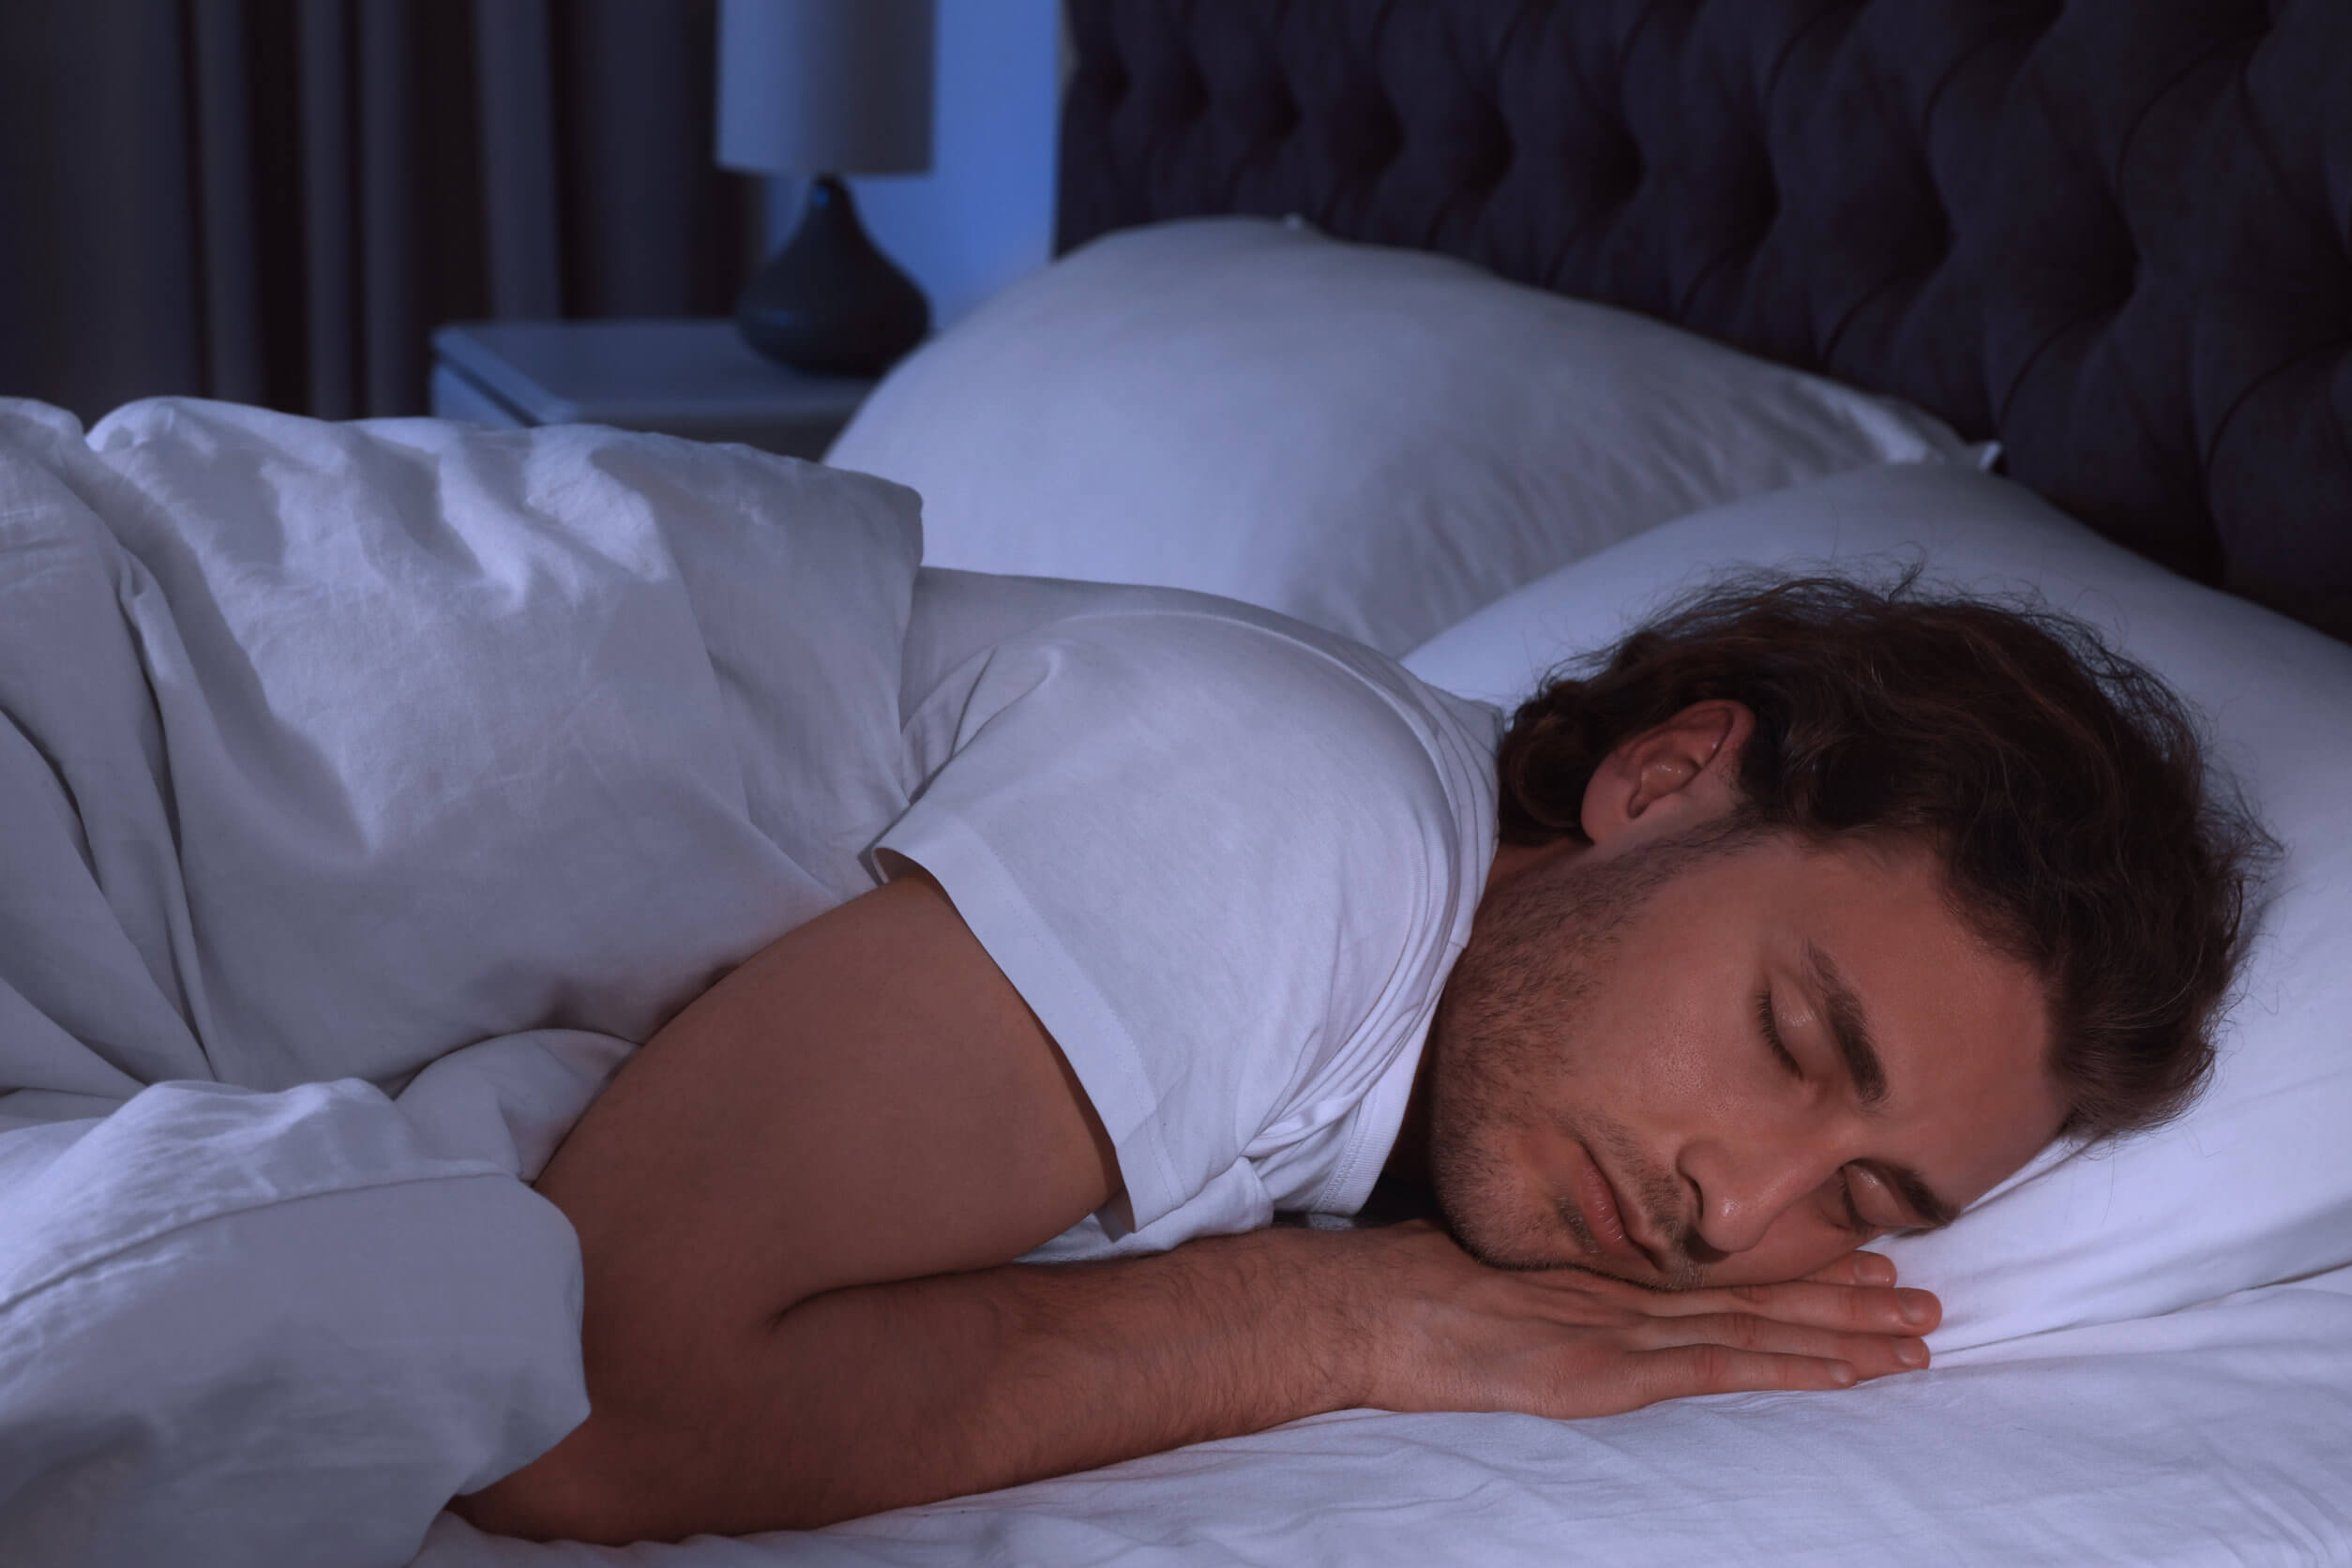 Dormir 8 horas diarias